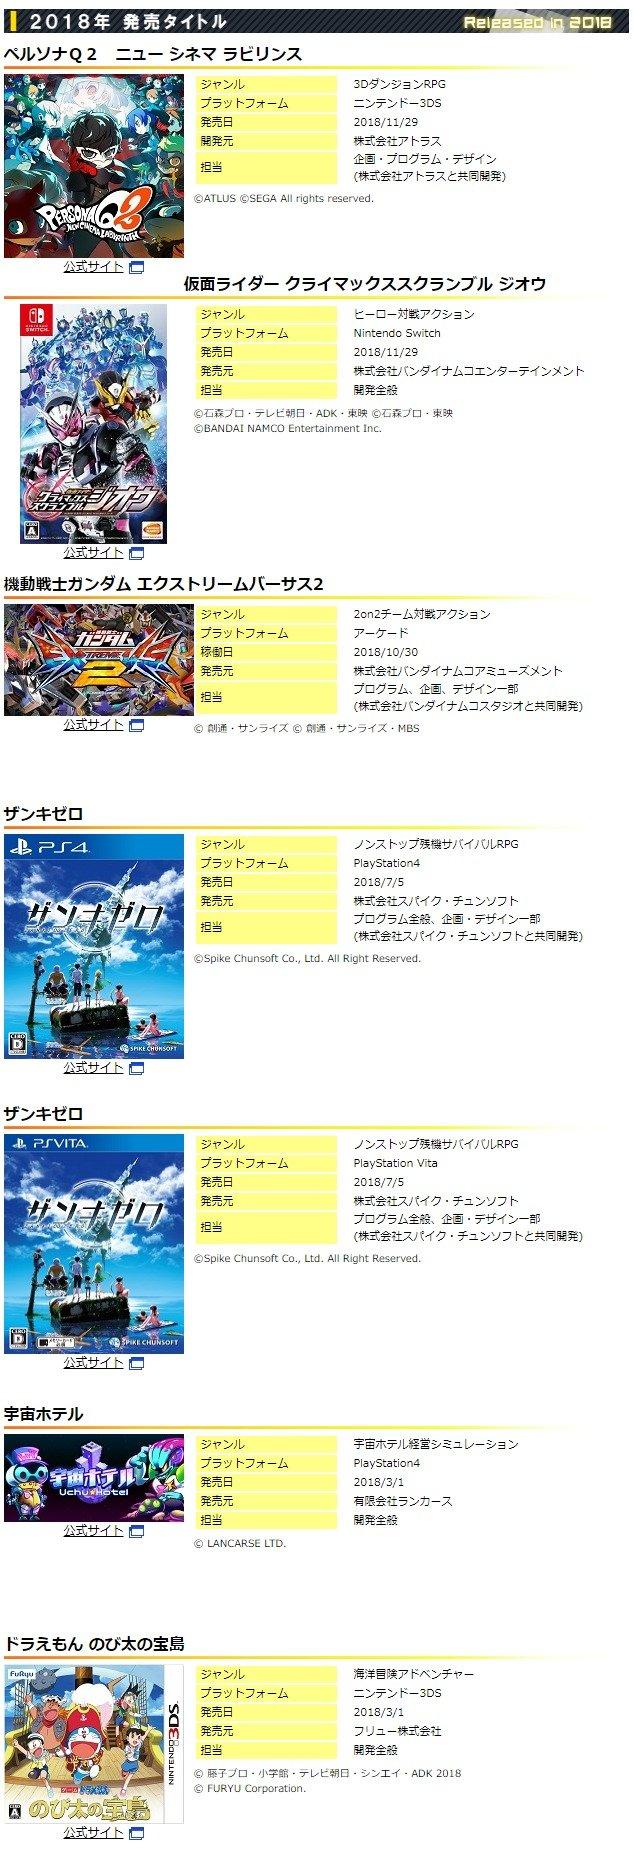 lancarse.co.jp_work.html